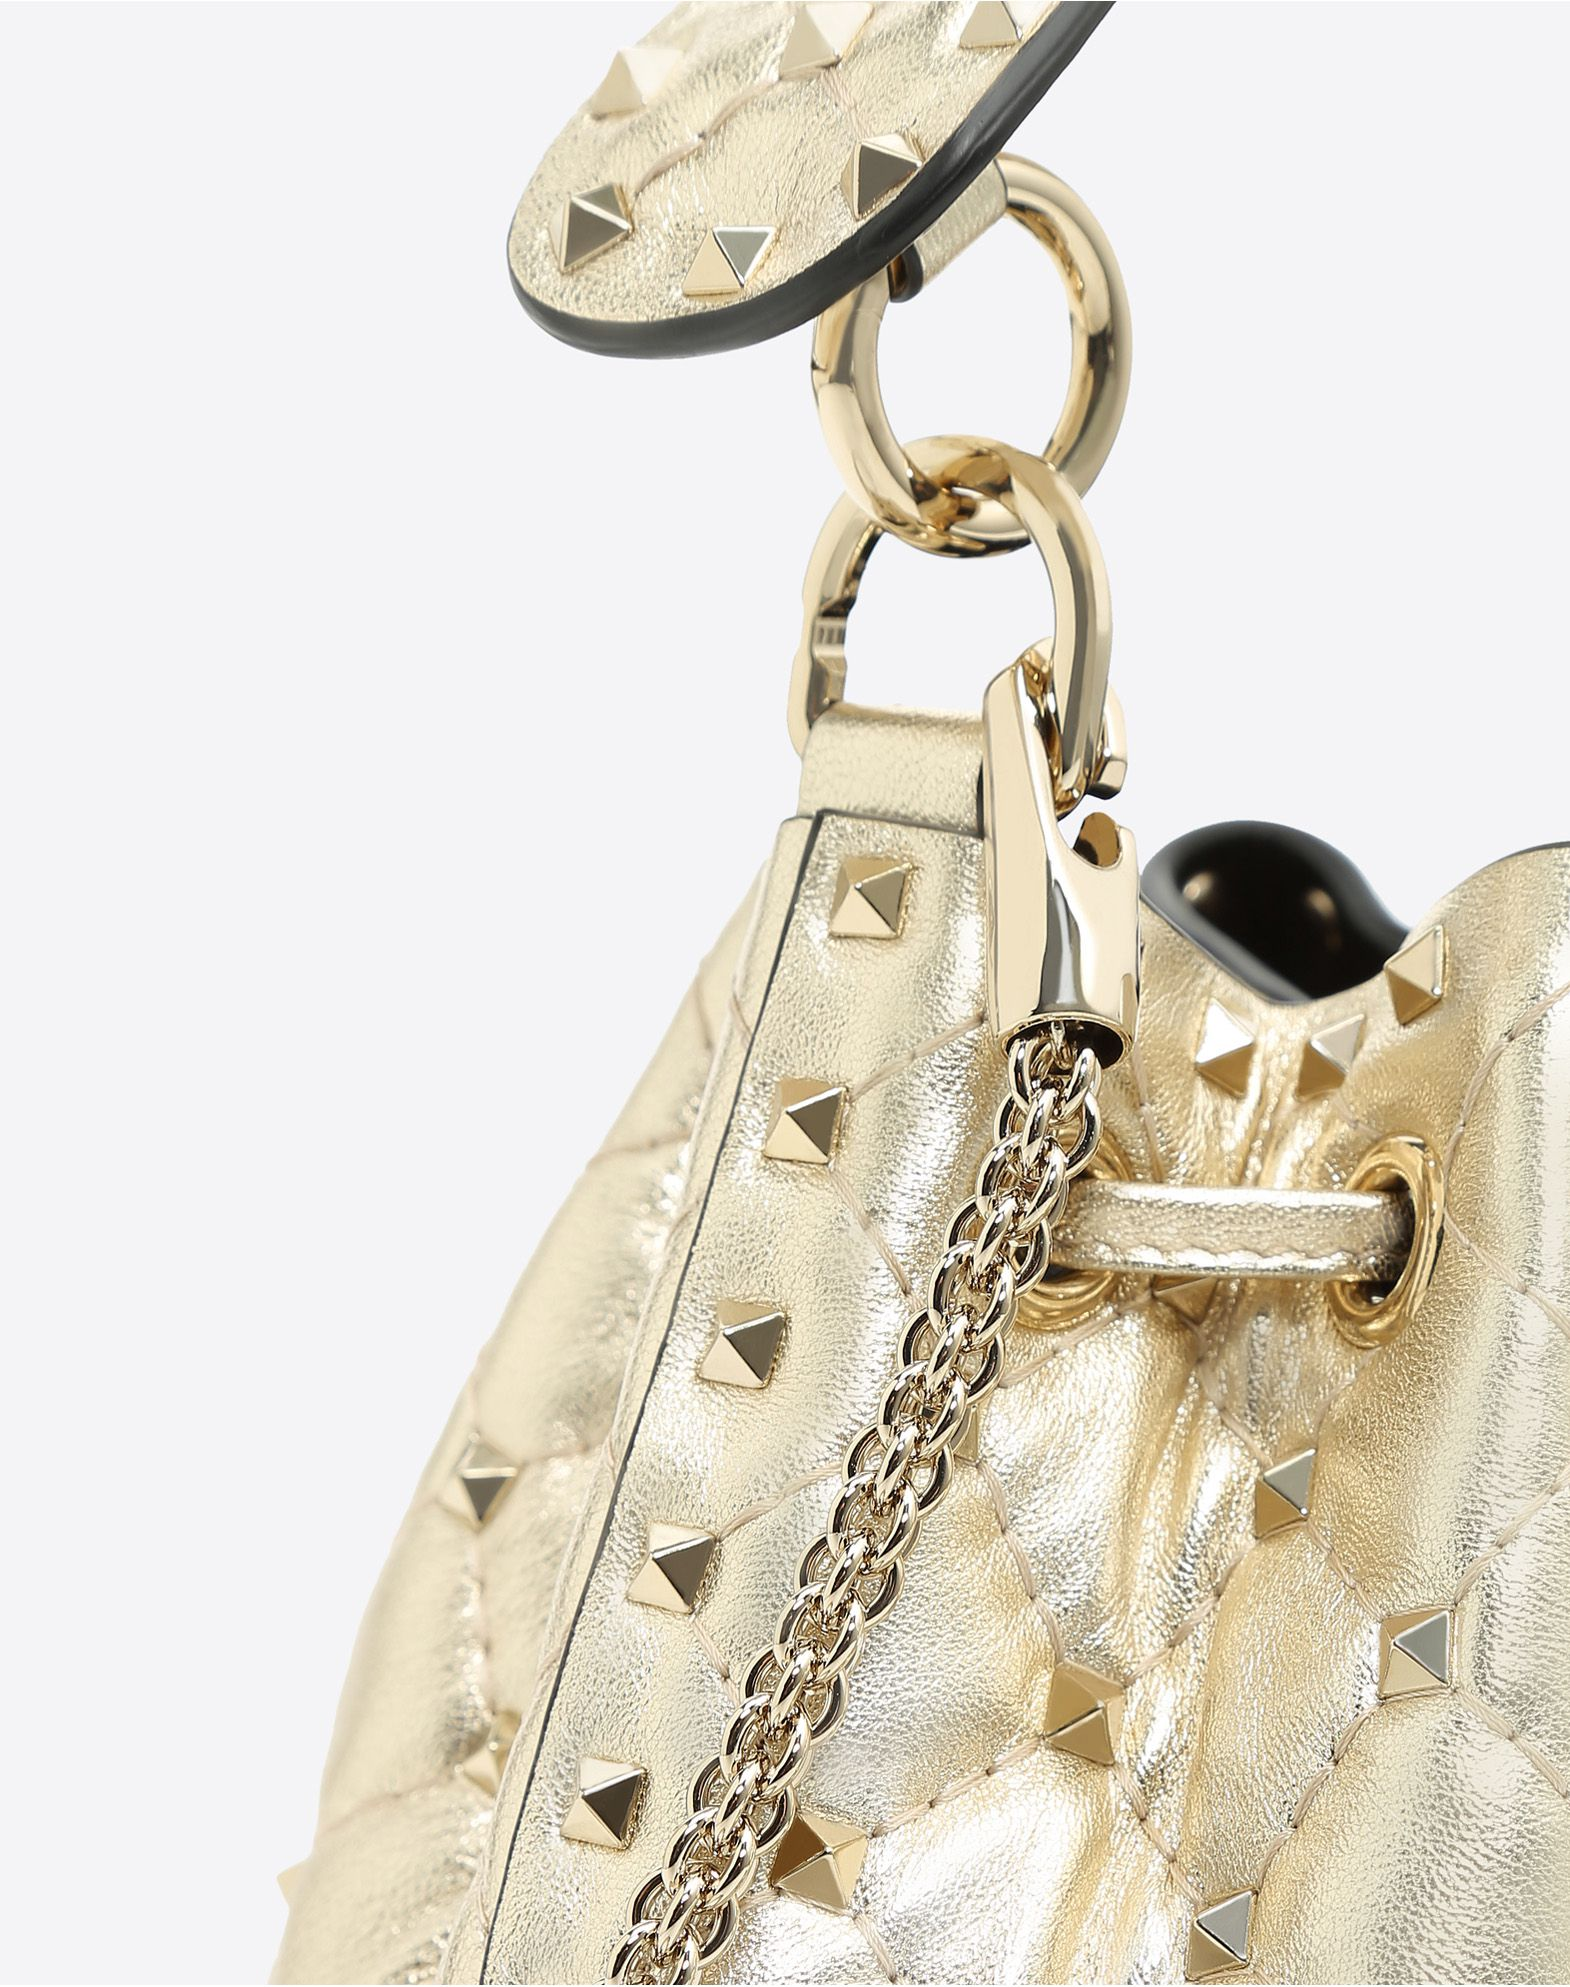 VALENTINO GARAVANI Rockstud Spike Small Bucket Bag  BUCKET BAG D b